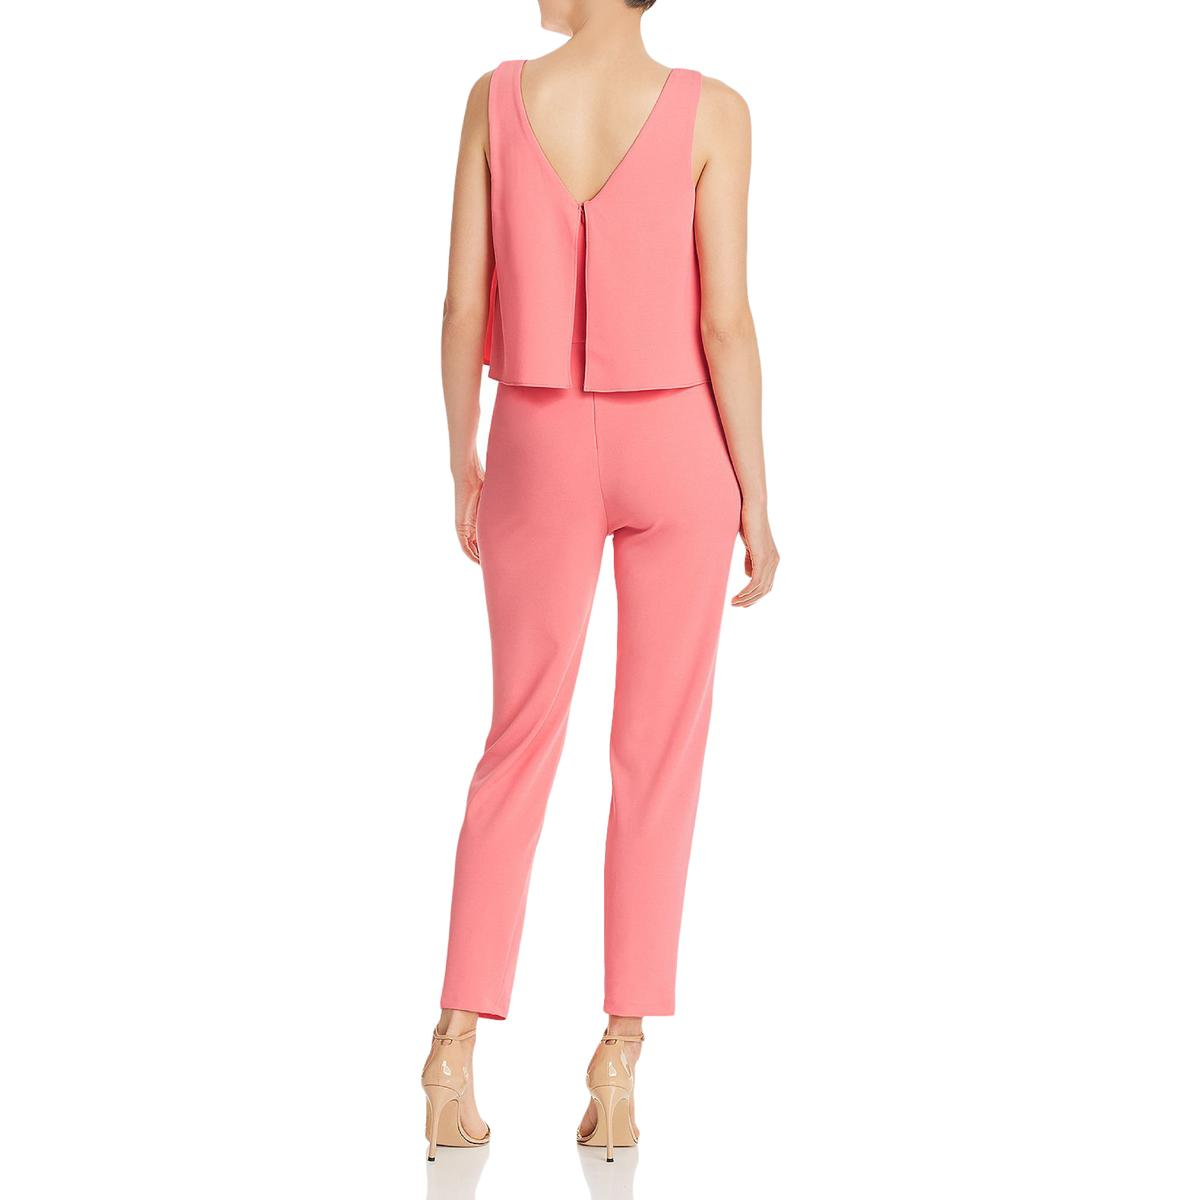 miniatuur 4 - Aqua Womens Cora Popover Straight Leg Dressy Jumpsuit BHFO 7046